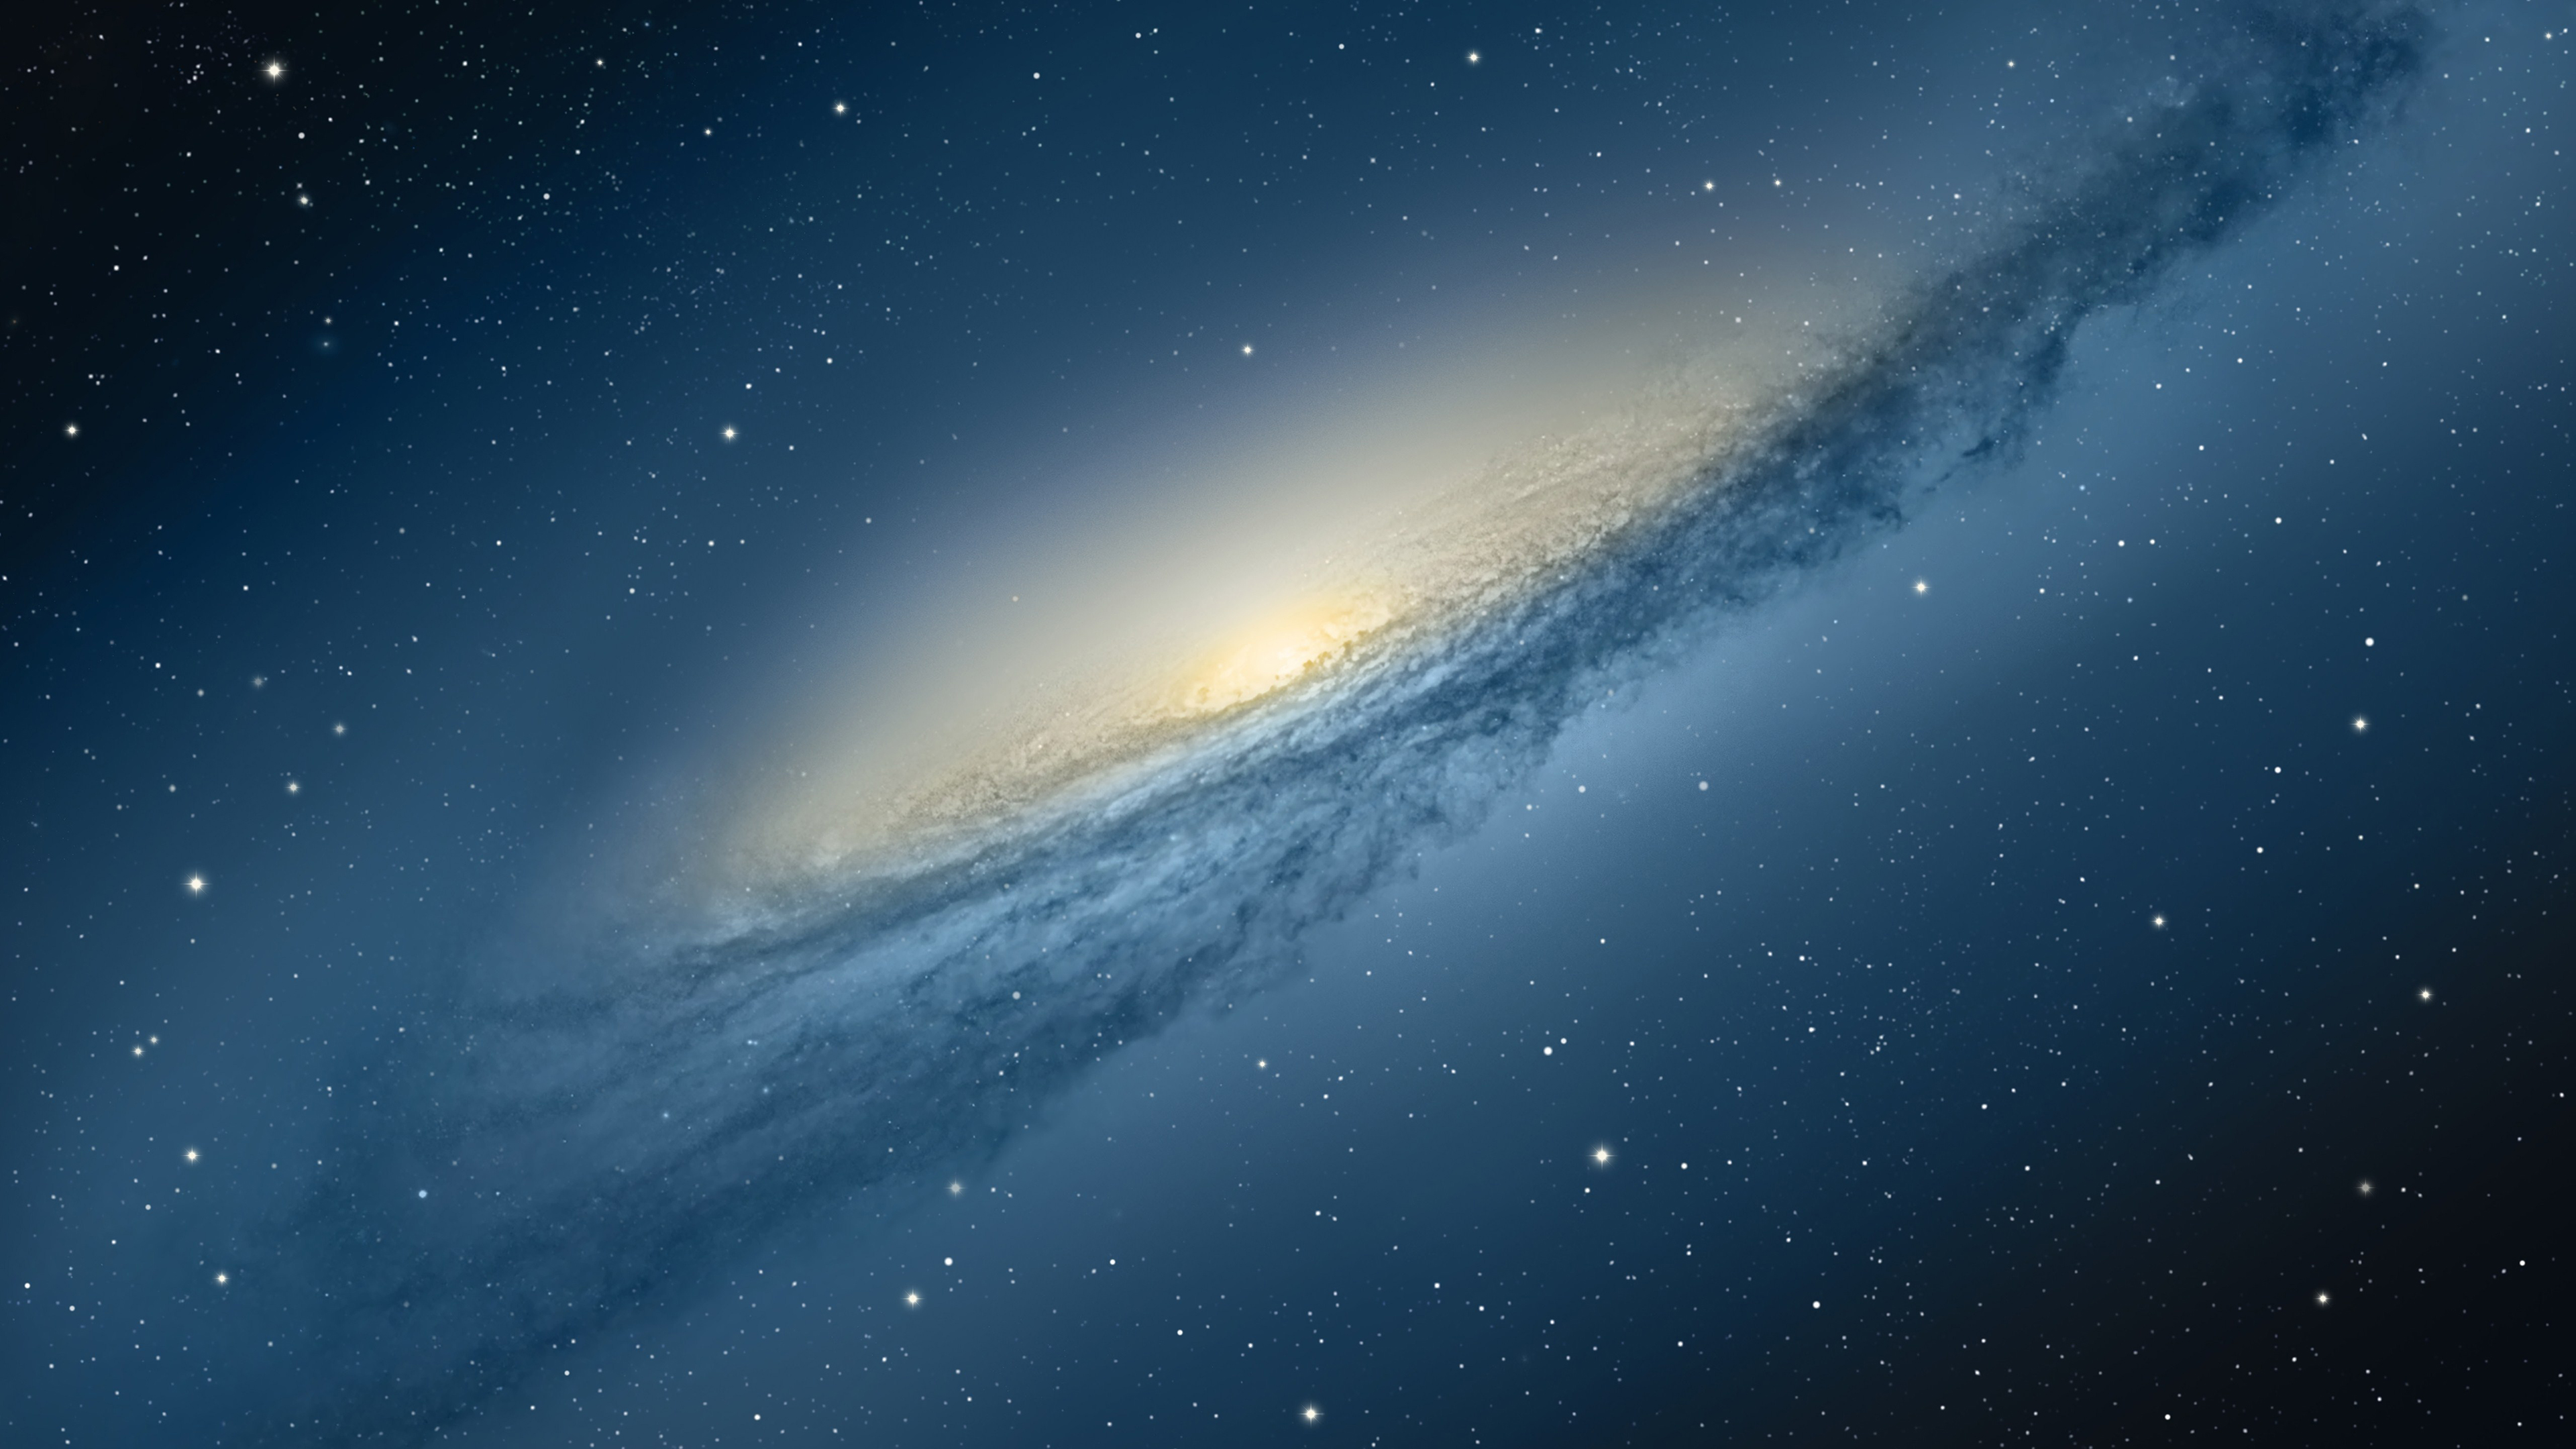 Space Planet Galaxy Stars Ultrahd 4k Wallpaper Wide